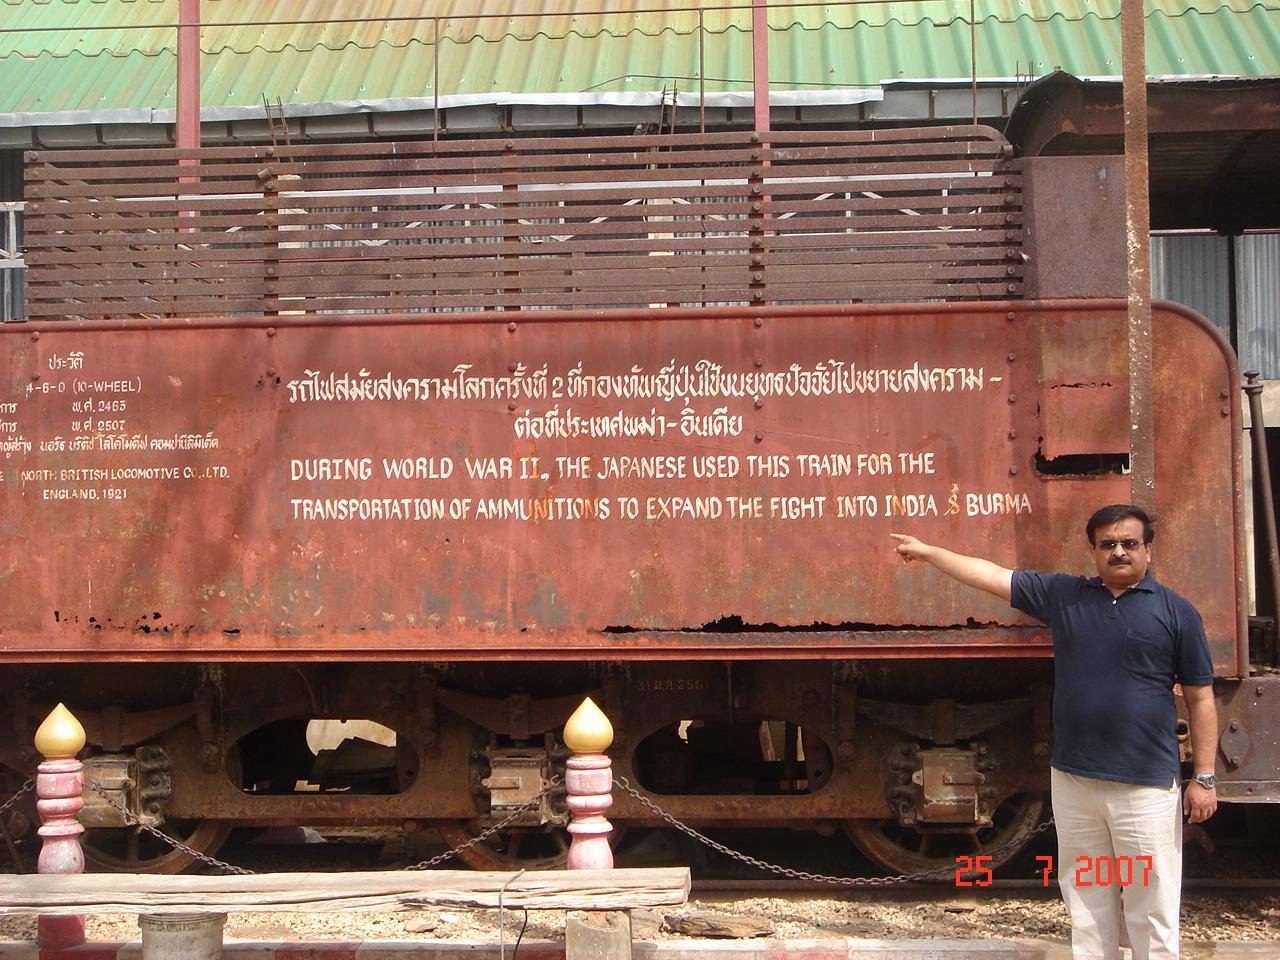 http://2.bp.blogspot.com/-Uq0tyKw1cnk/T09Qdx5QzDI/AAAAAAAABGE/TPvCjLwi5k4/s1600/Dad+in+front+of+WWII+train+1.jpg